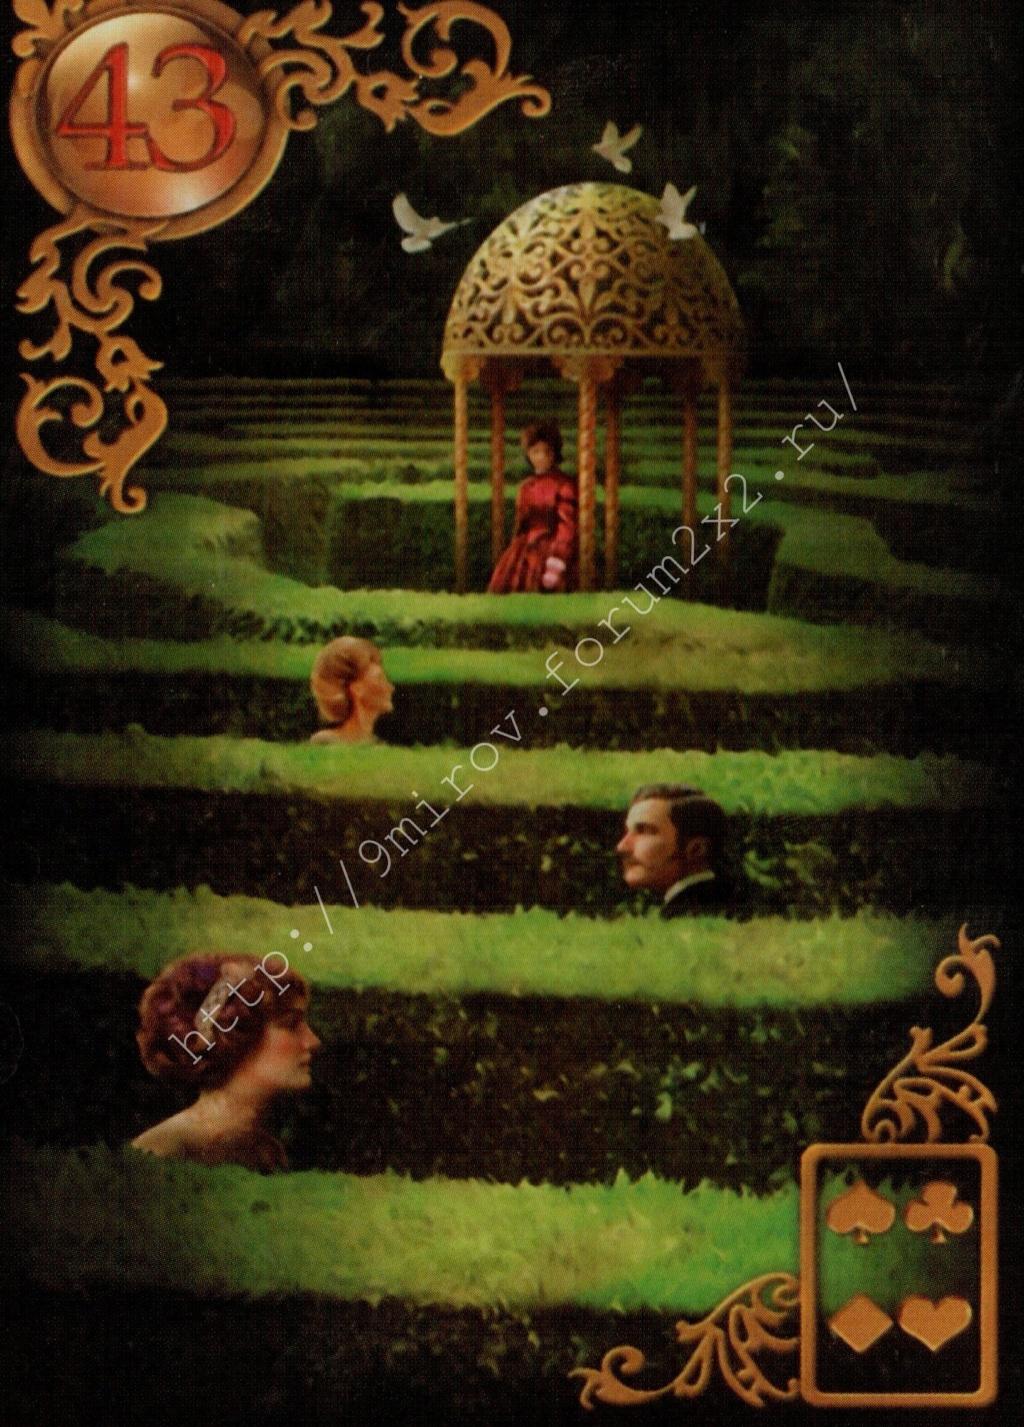 Золотые мечты Ленорман (Расширенное издание) | Gilded Reverie Lenormand. Галерея.  Water135